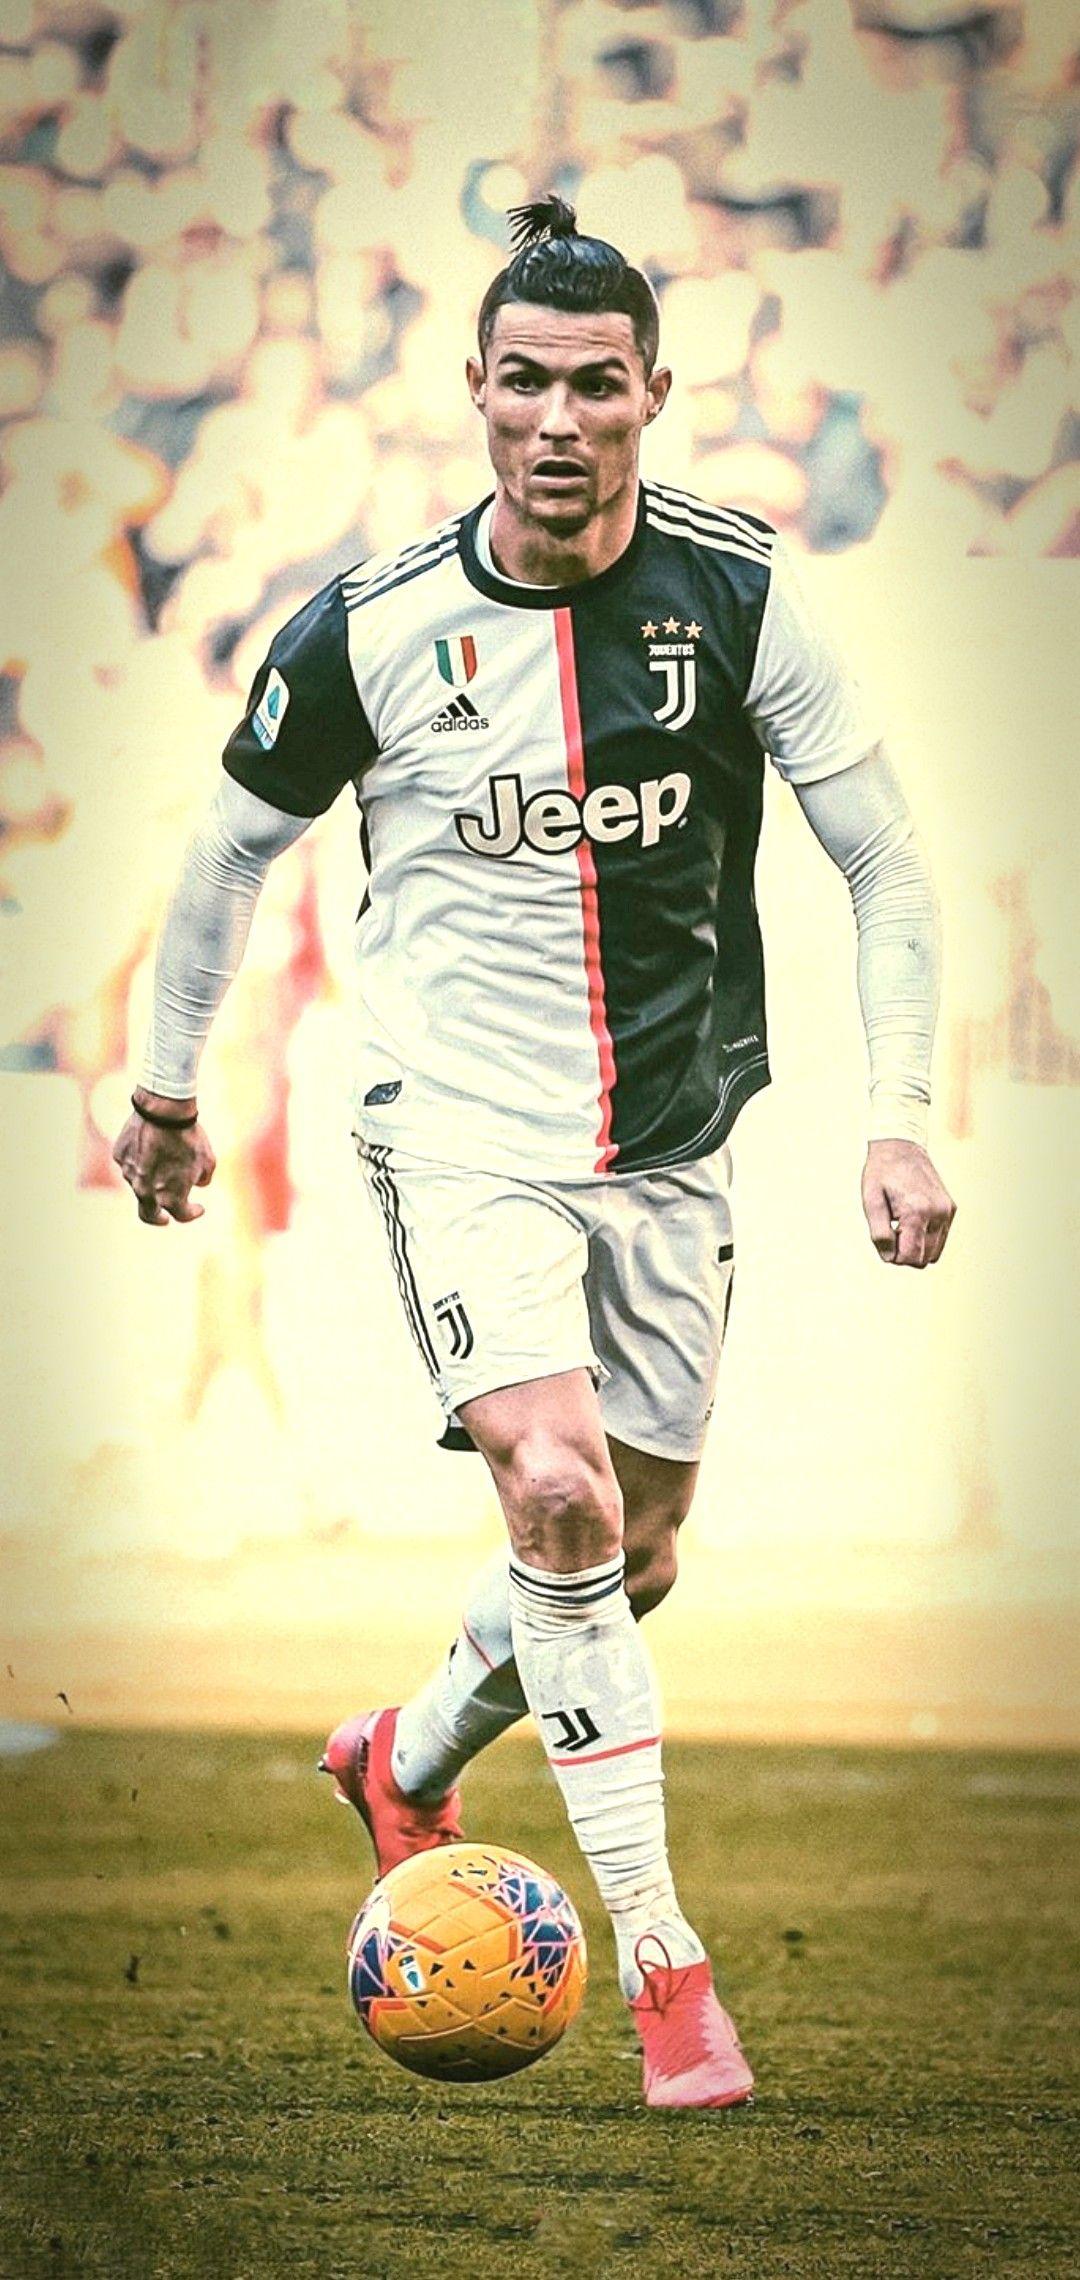 Cristiano Ronaldo In 2020 Ronaldo Football Ronaldo Cristiano Ronaldo Manchester